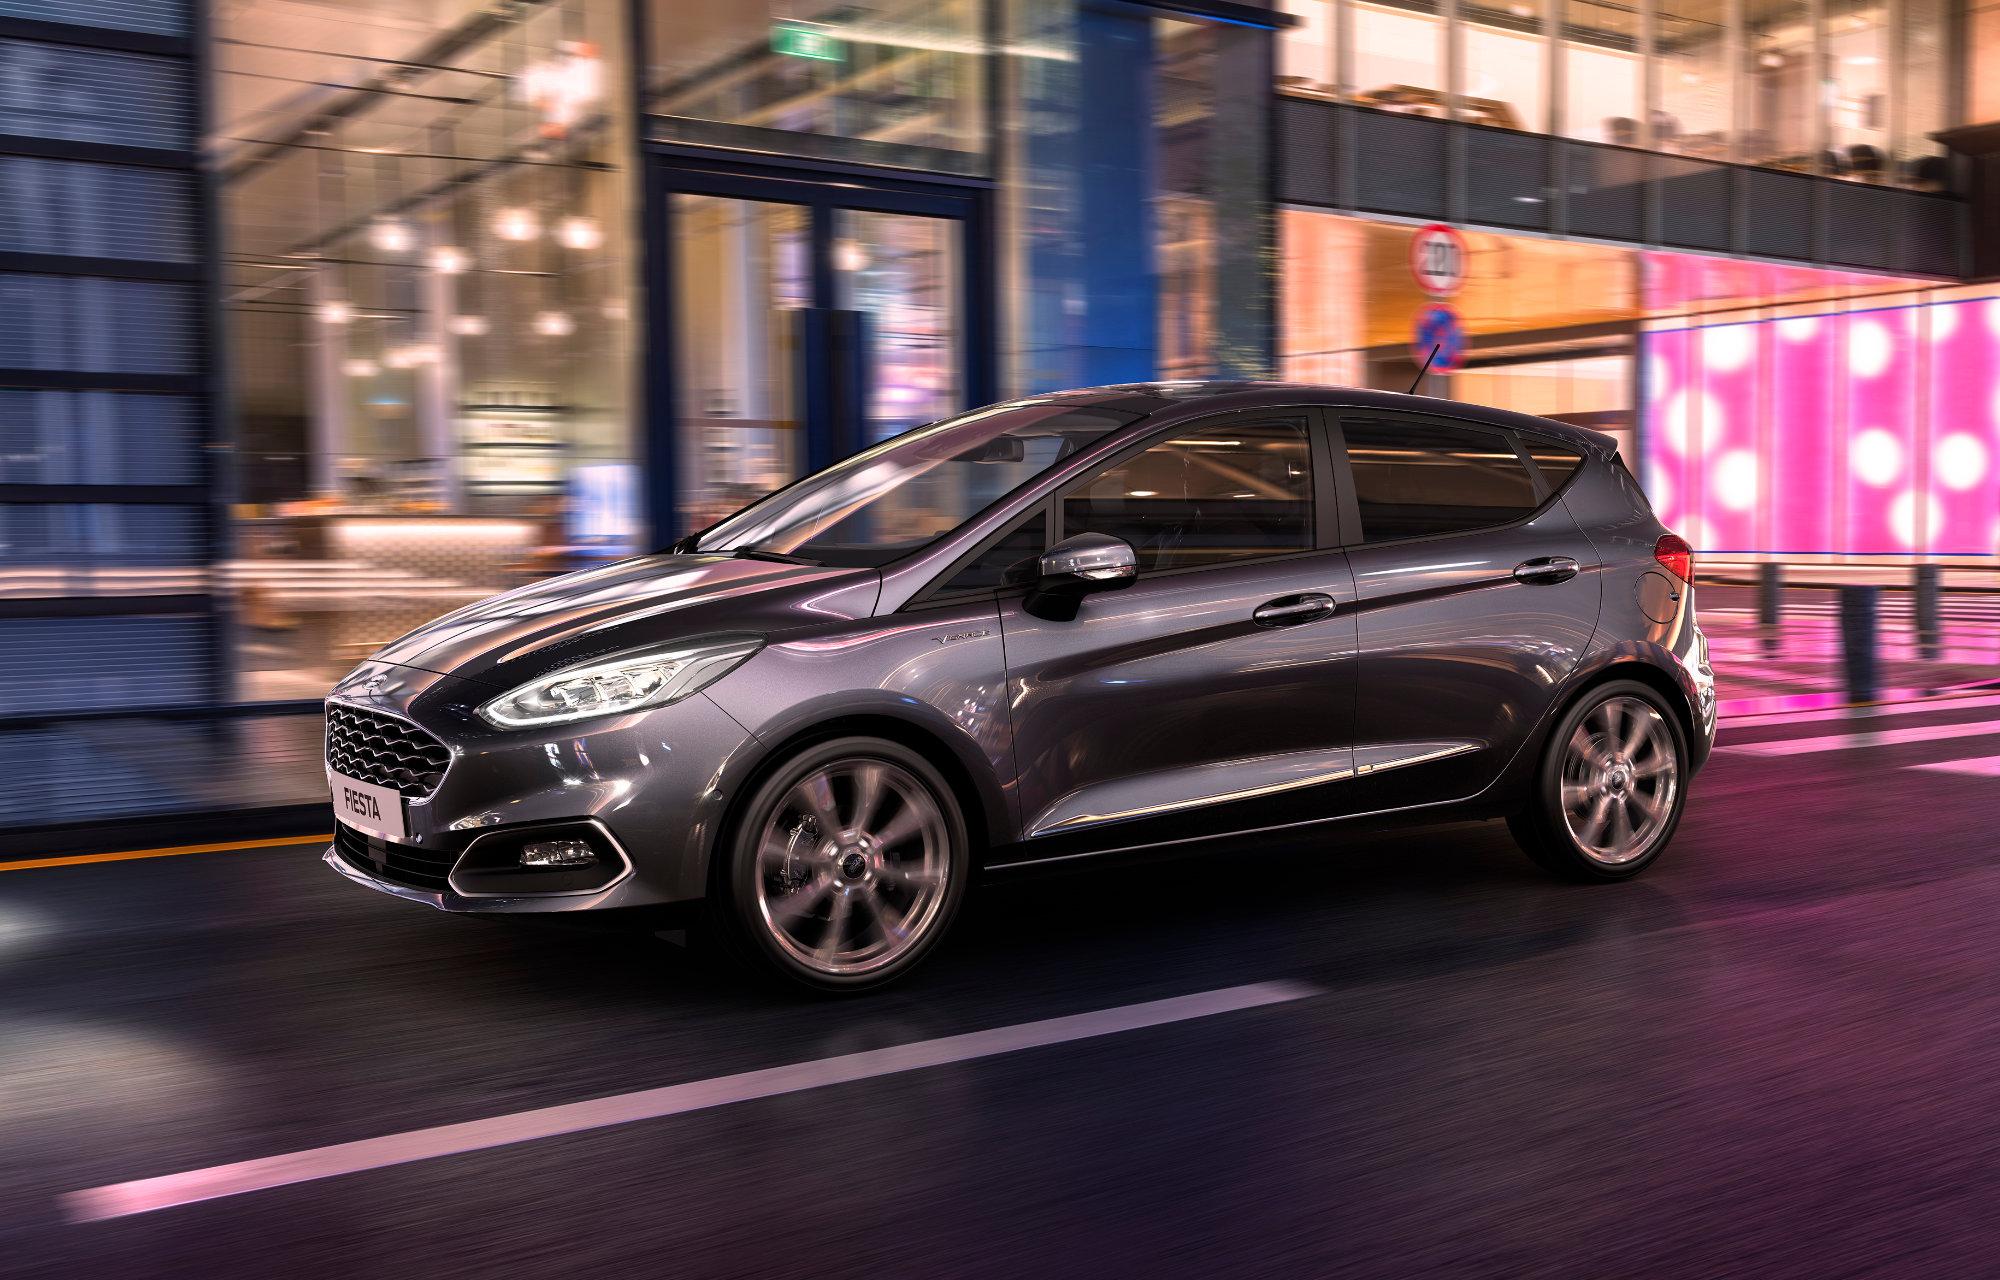 Ford Fiesta Mild Hybrid